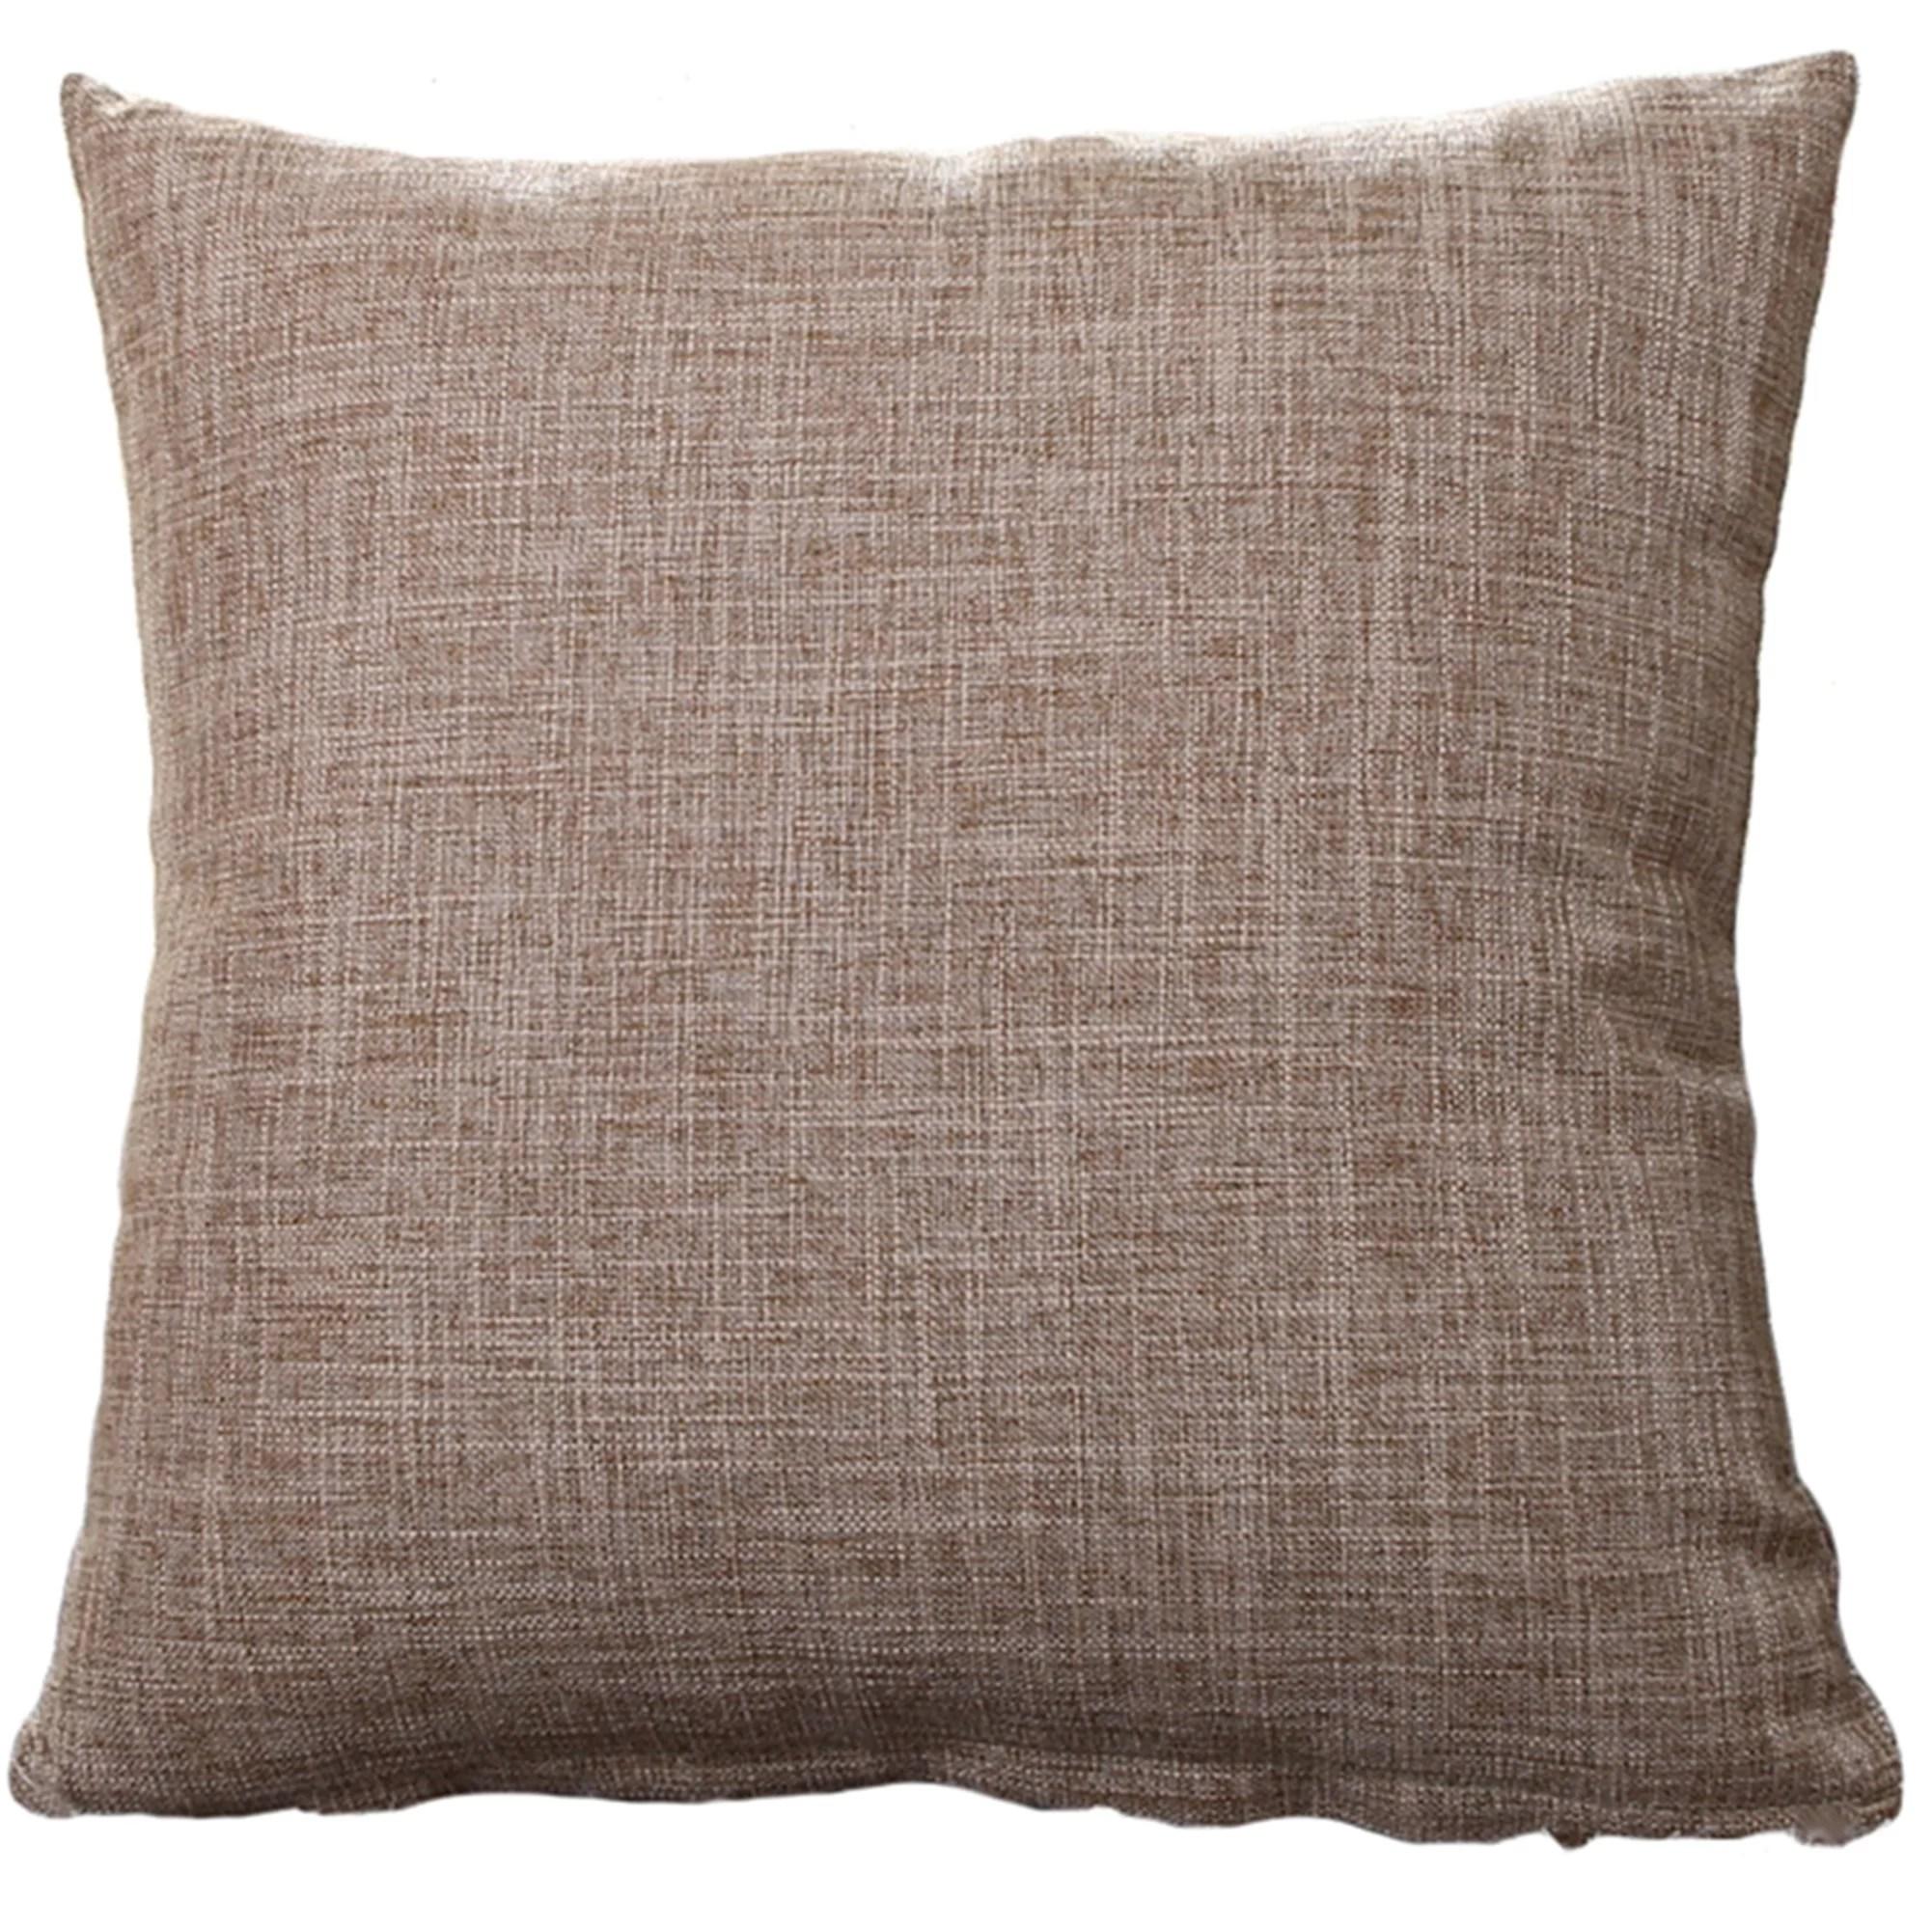 obryan super soft square pillow cover set of 2